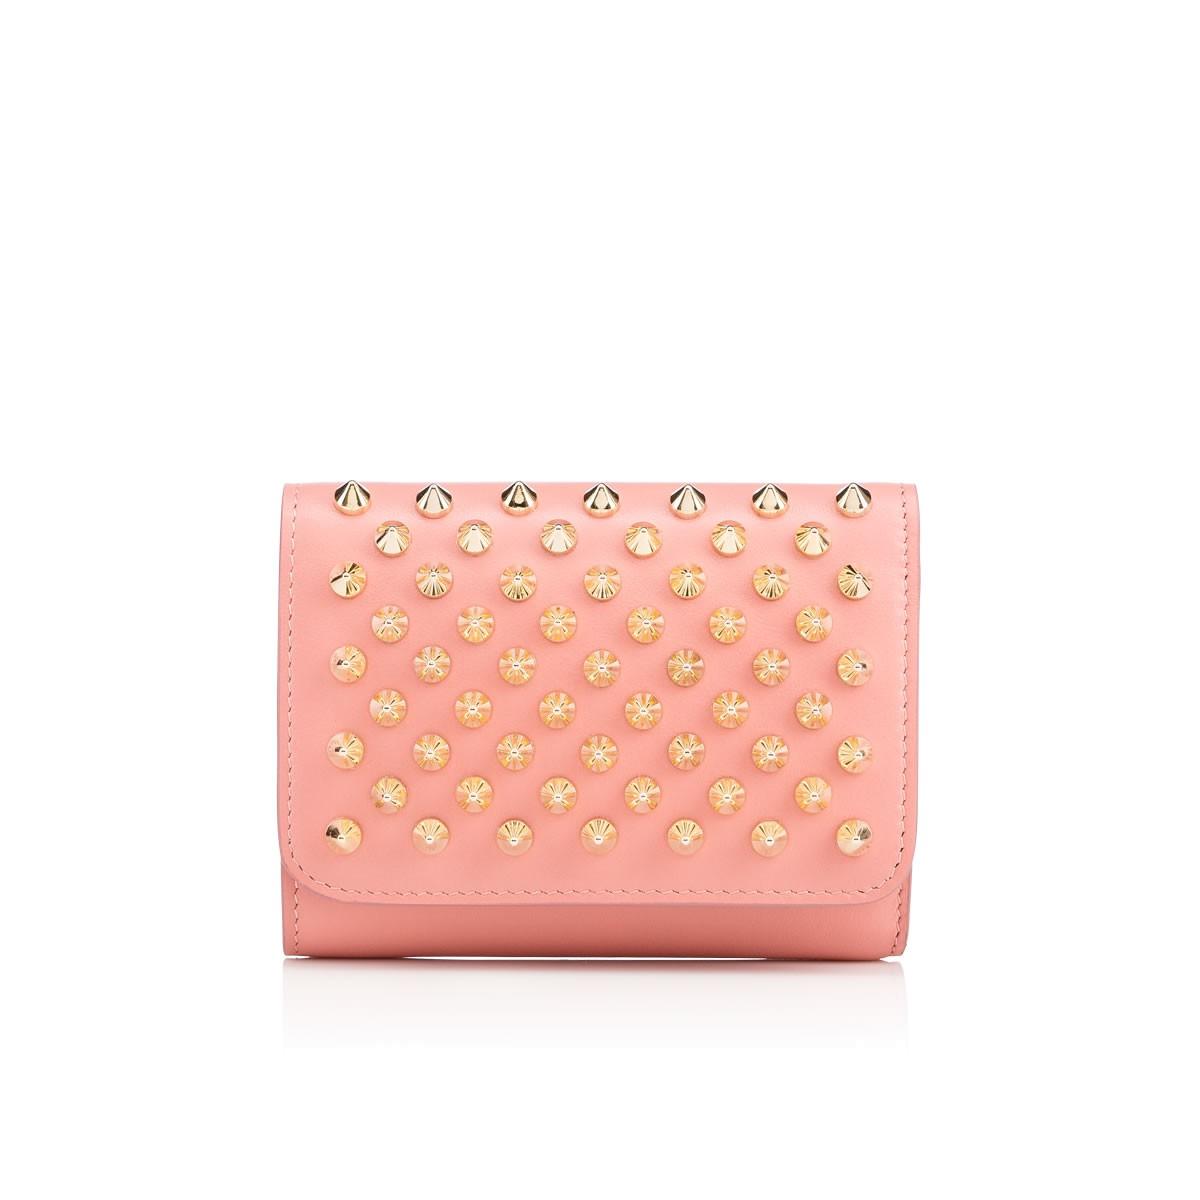 b61d0608b2b Macaron Mini Studded Leather Wallet in Ronsard